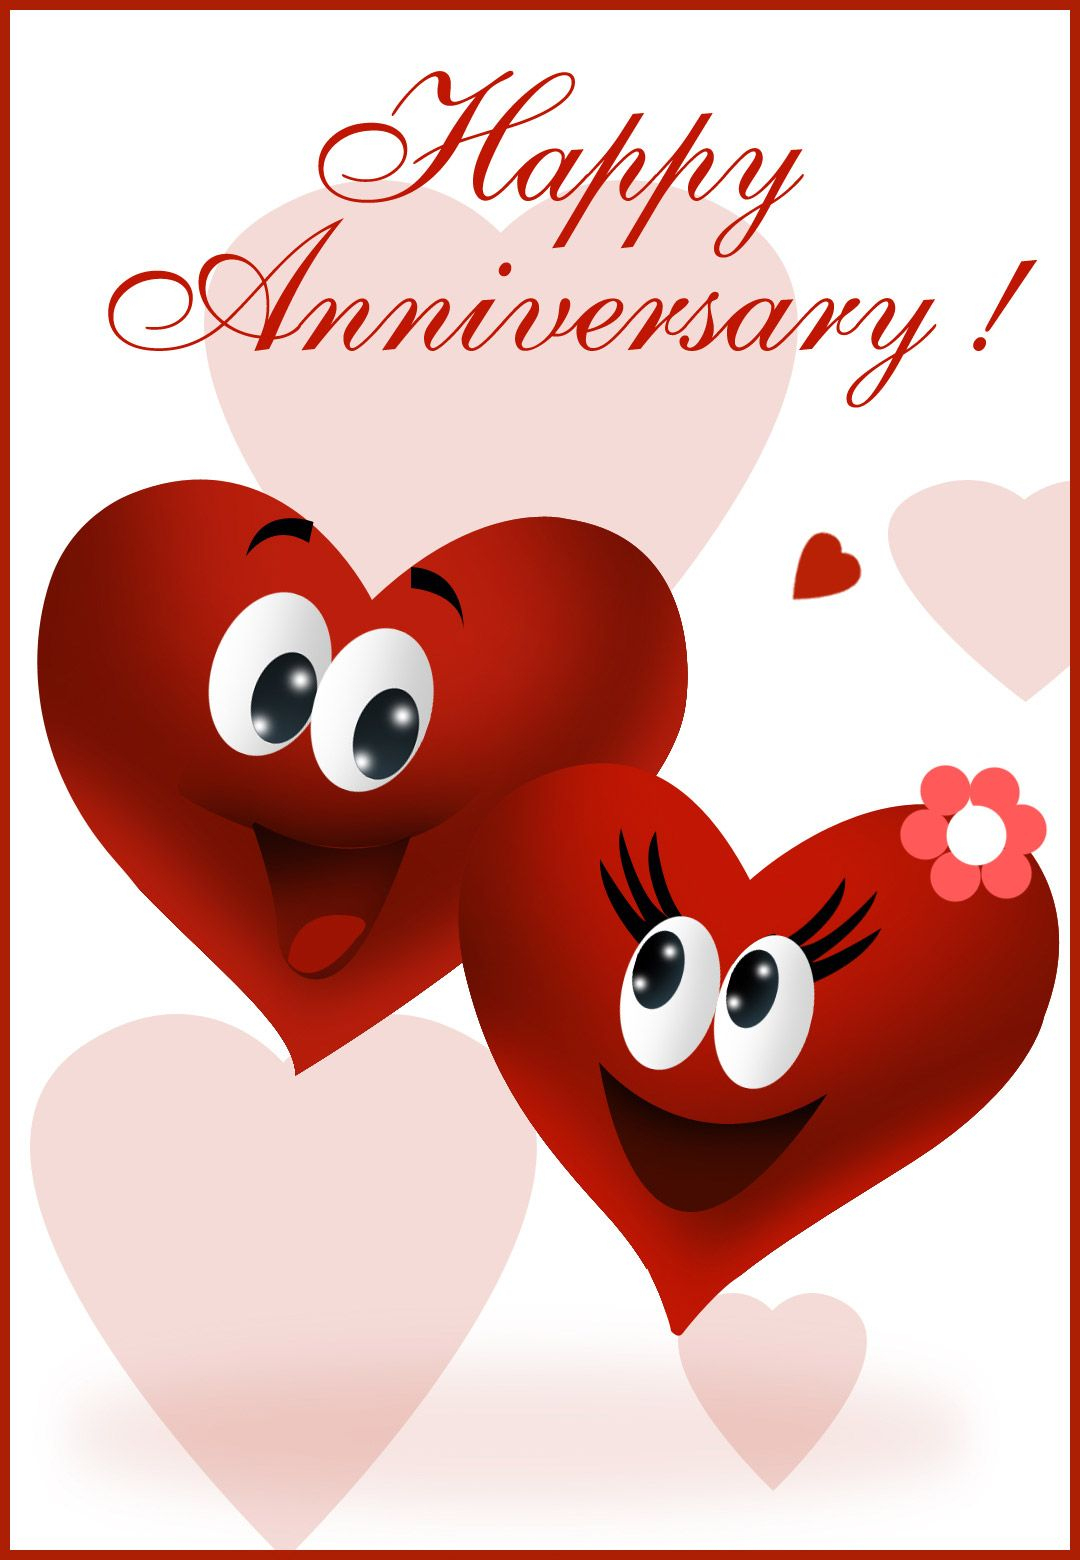 Free Printable Happy Anniversary Greeting Card | Anniversary - Free Printable Romantic Birthday Cards